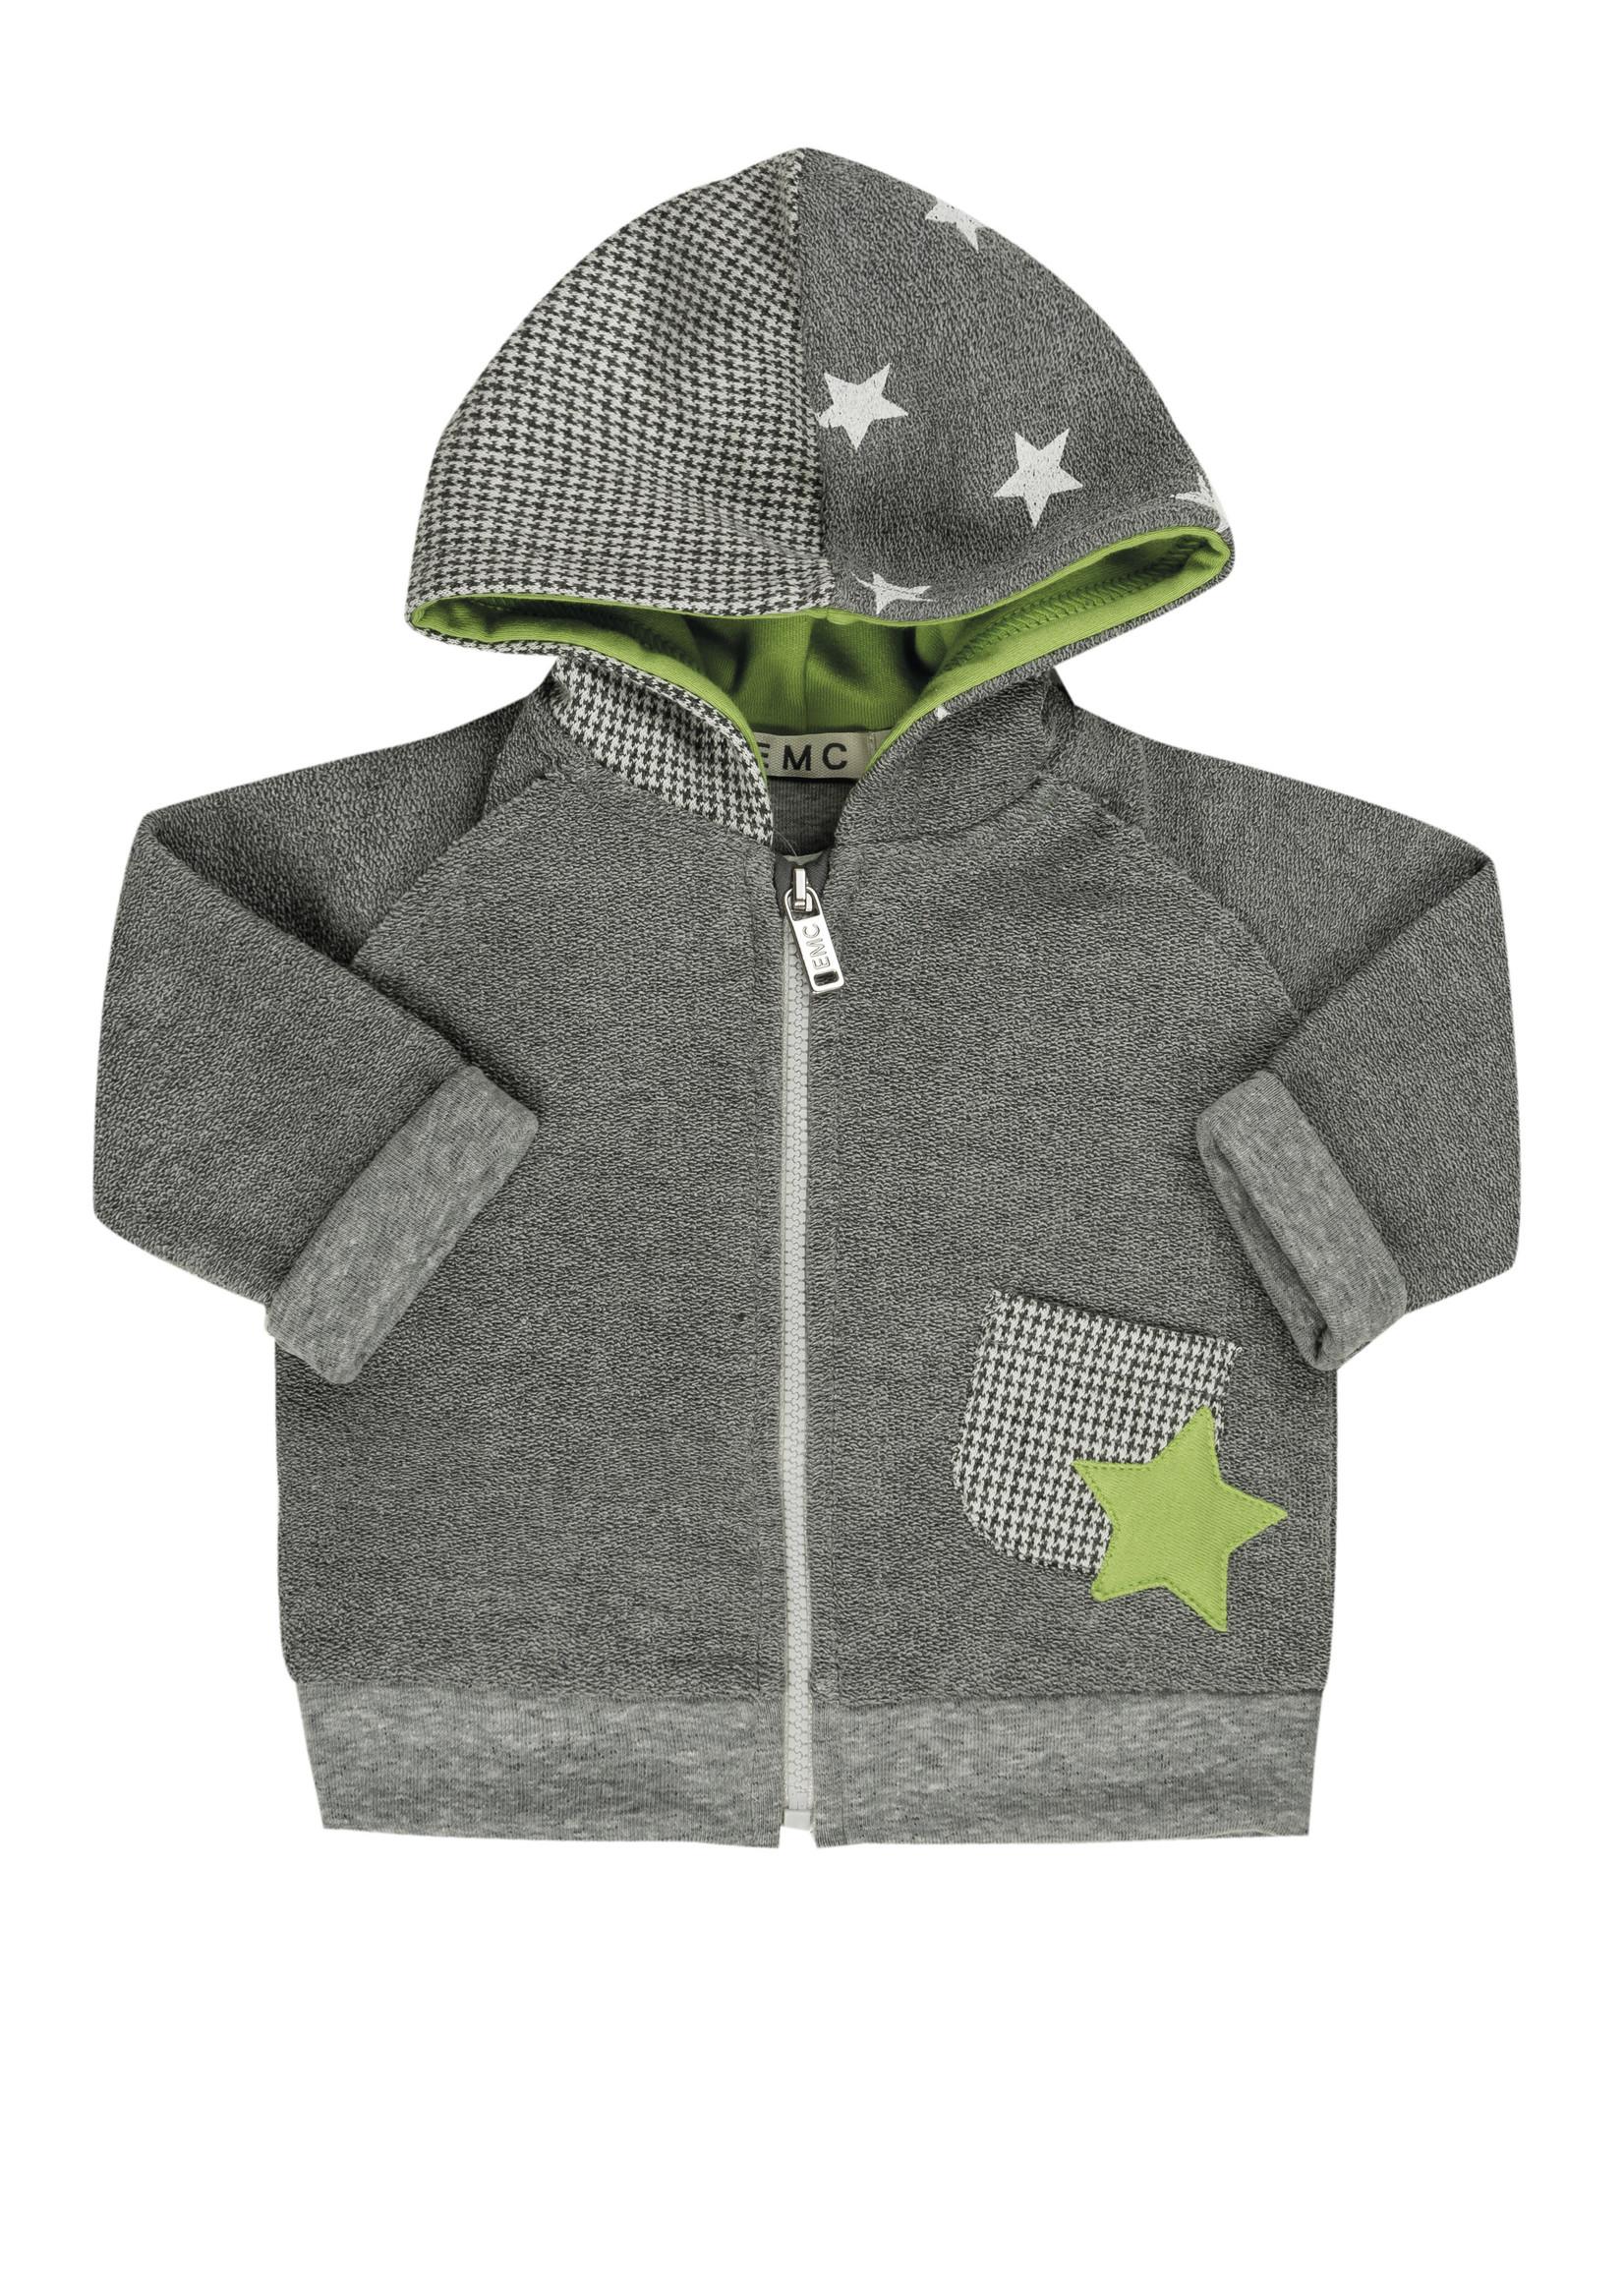 EMC EMC zipped hoodie green star